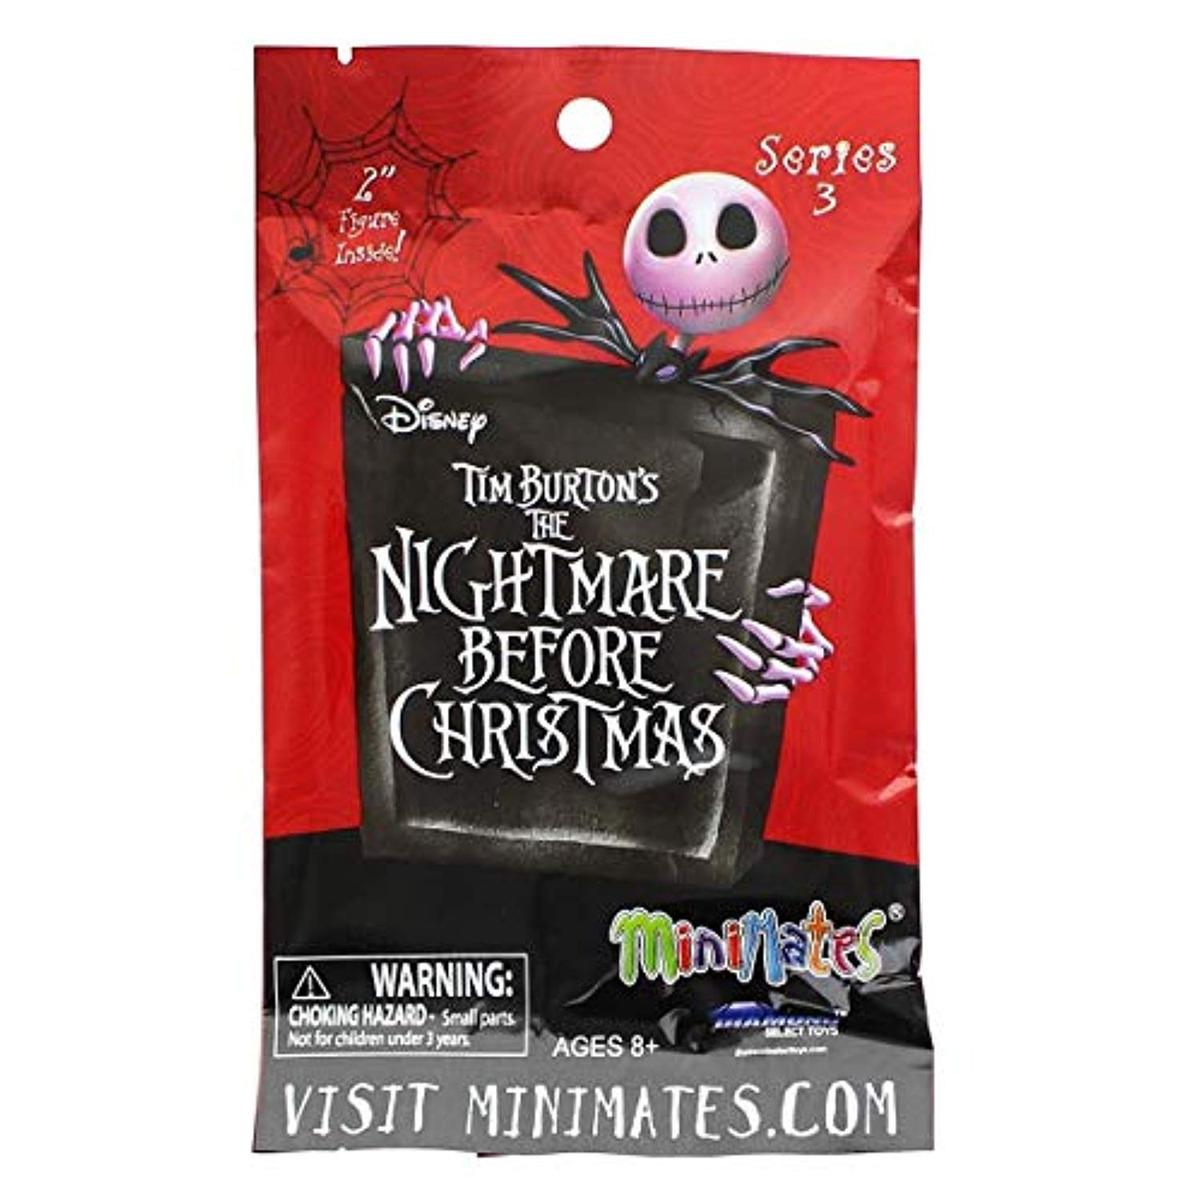 Nightmare Before Christmas Minimates Blind Bag Series 3 Sally